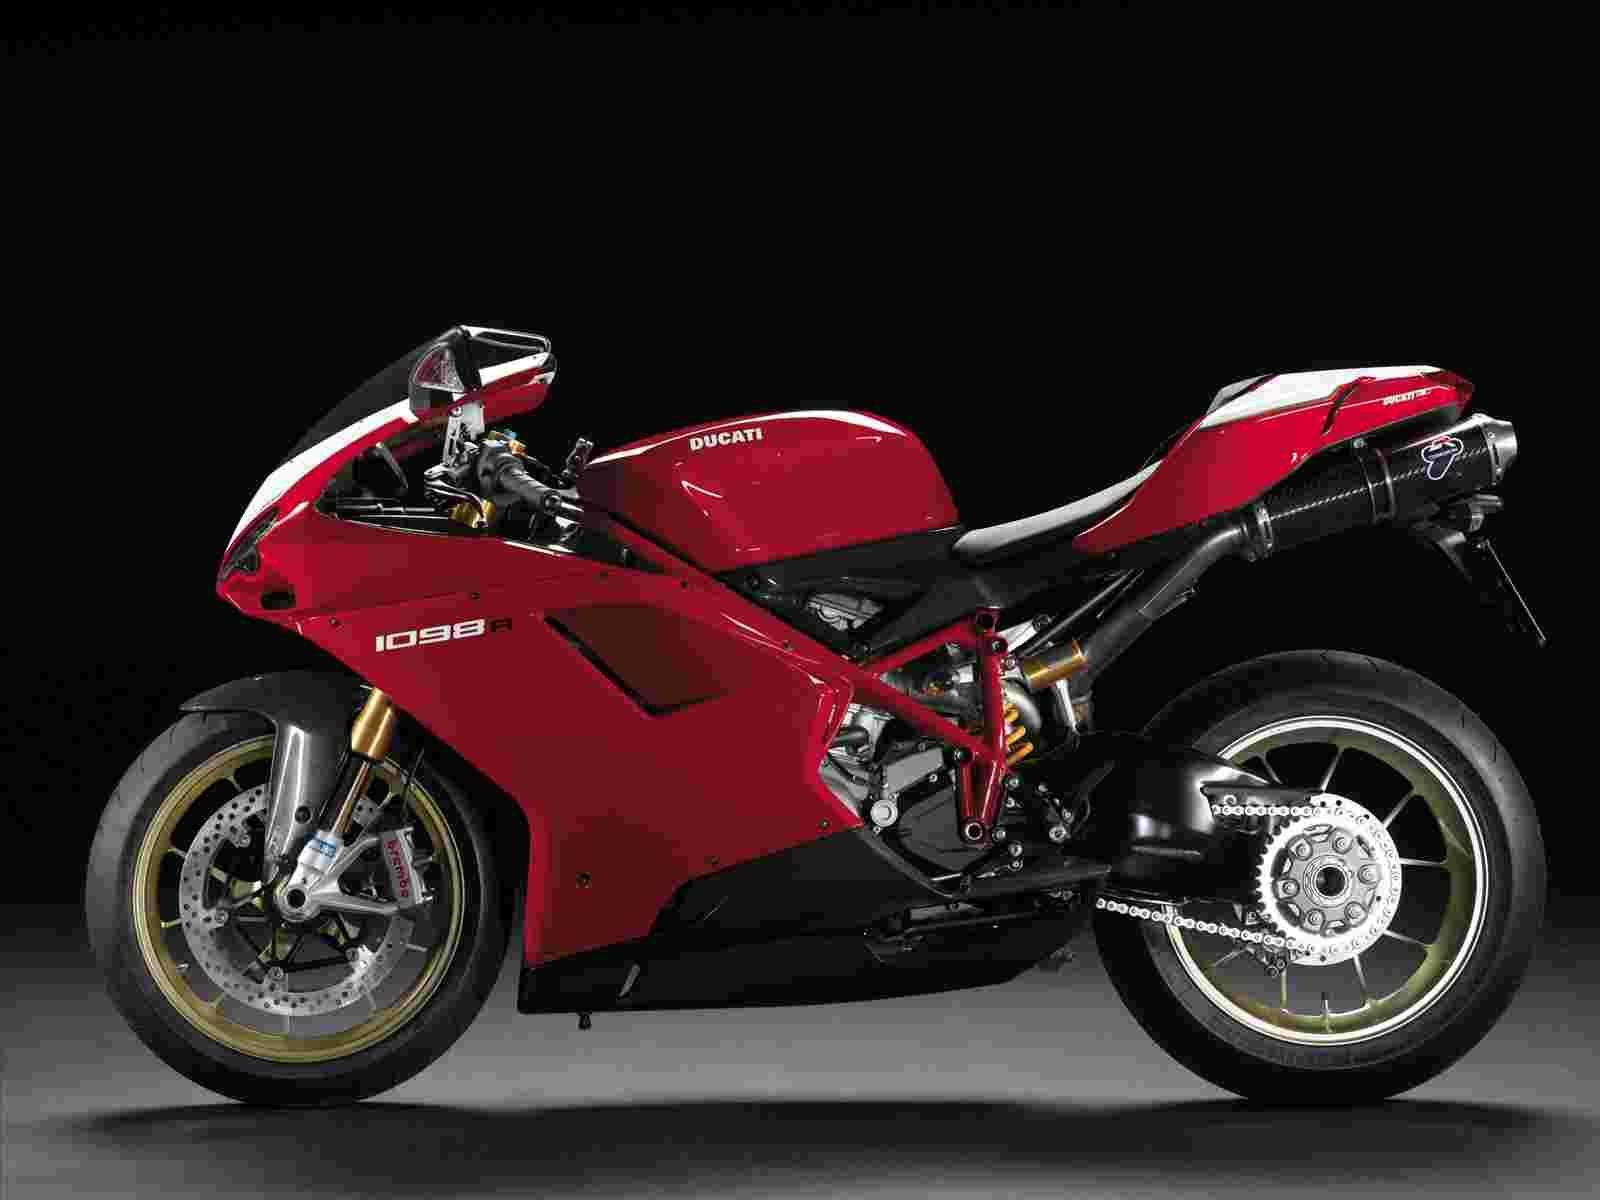 Ducati 1098 Wallpaper 20912 Hd Wallpapers in Bikes   Imagescicom 1600x1200